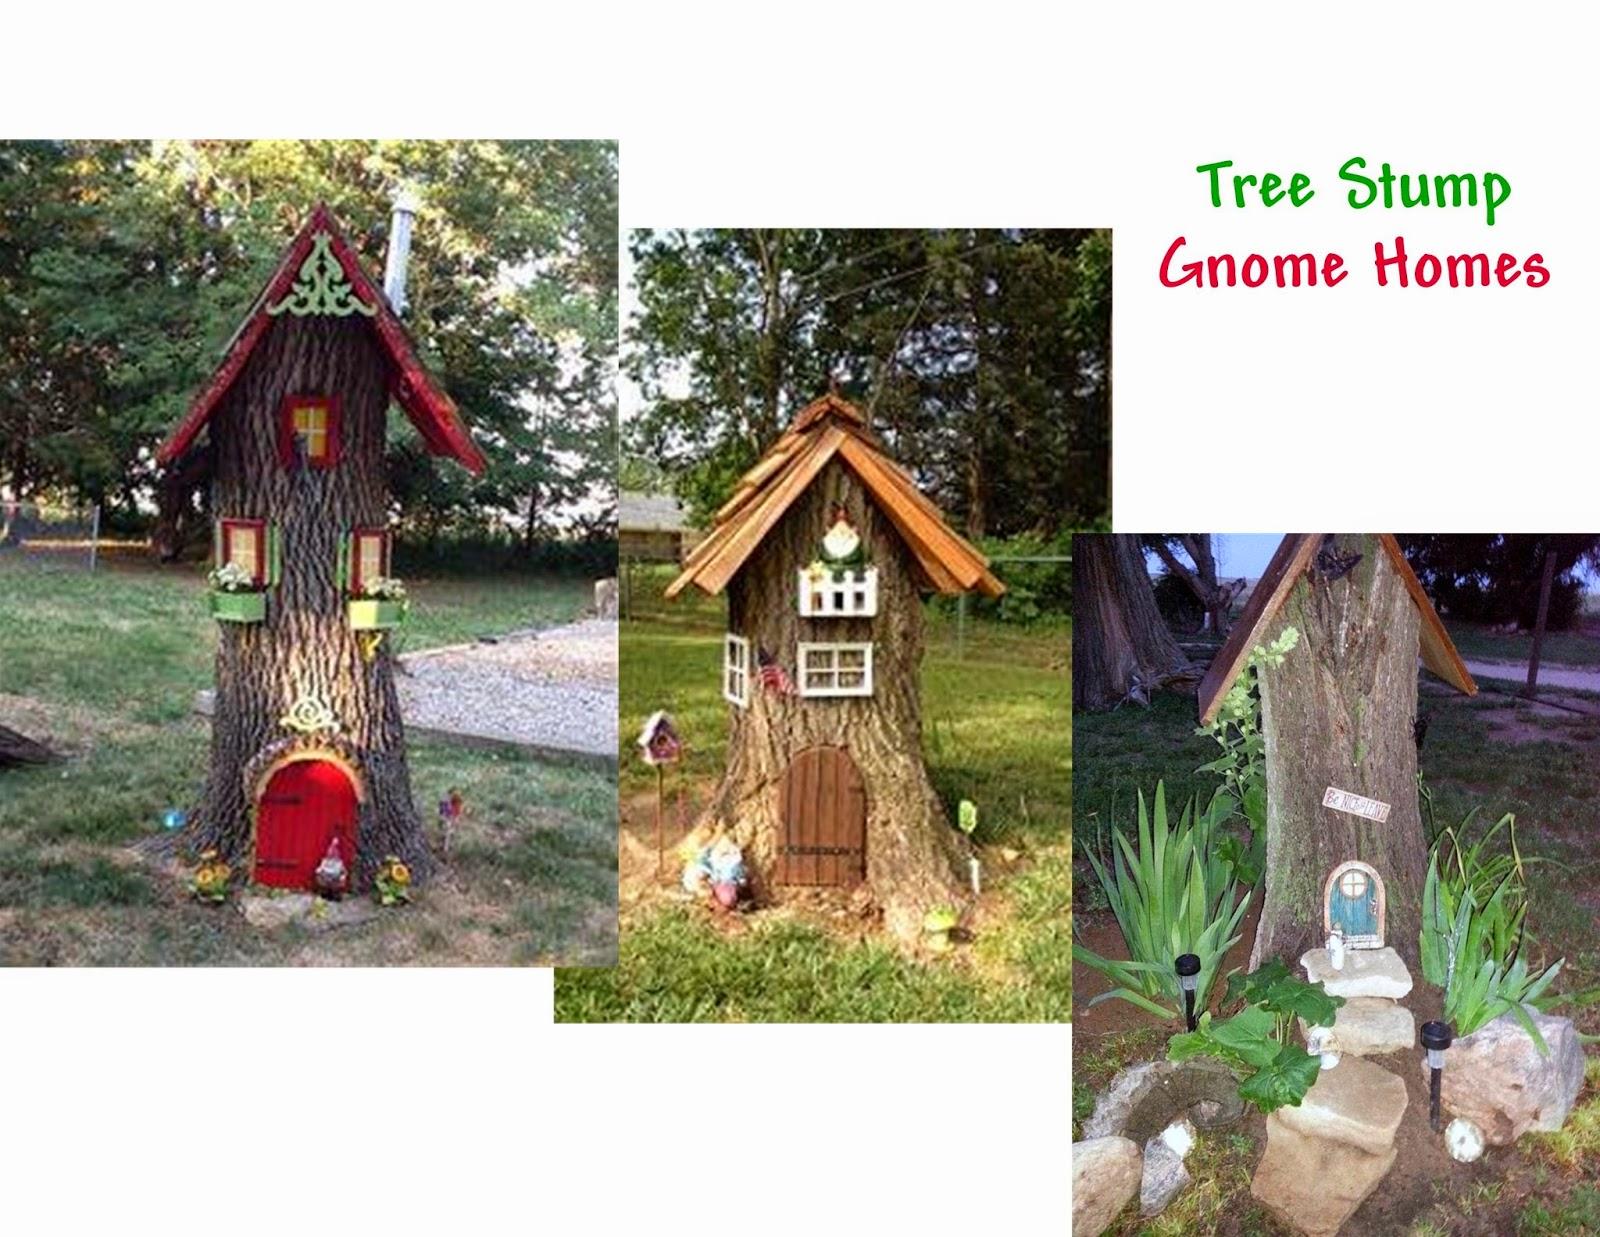 Gnome Tree Stump Home: Hodgepodge From The Geranium Farm: Tree Stump Gnome Homes